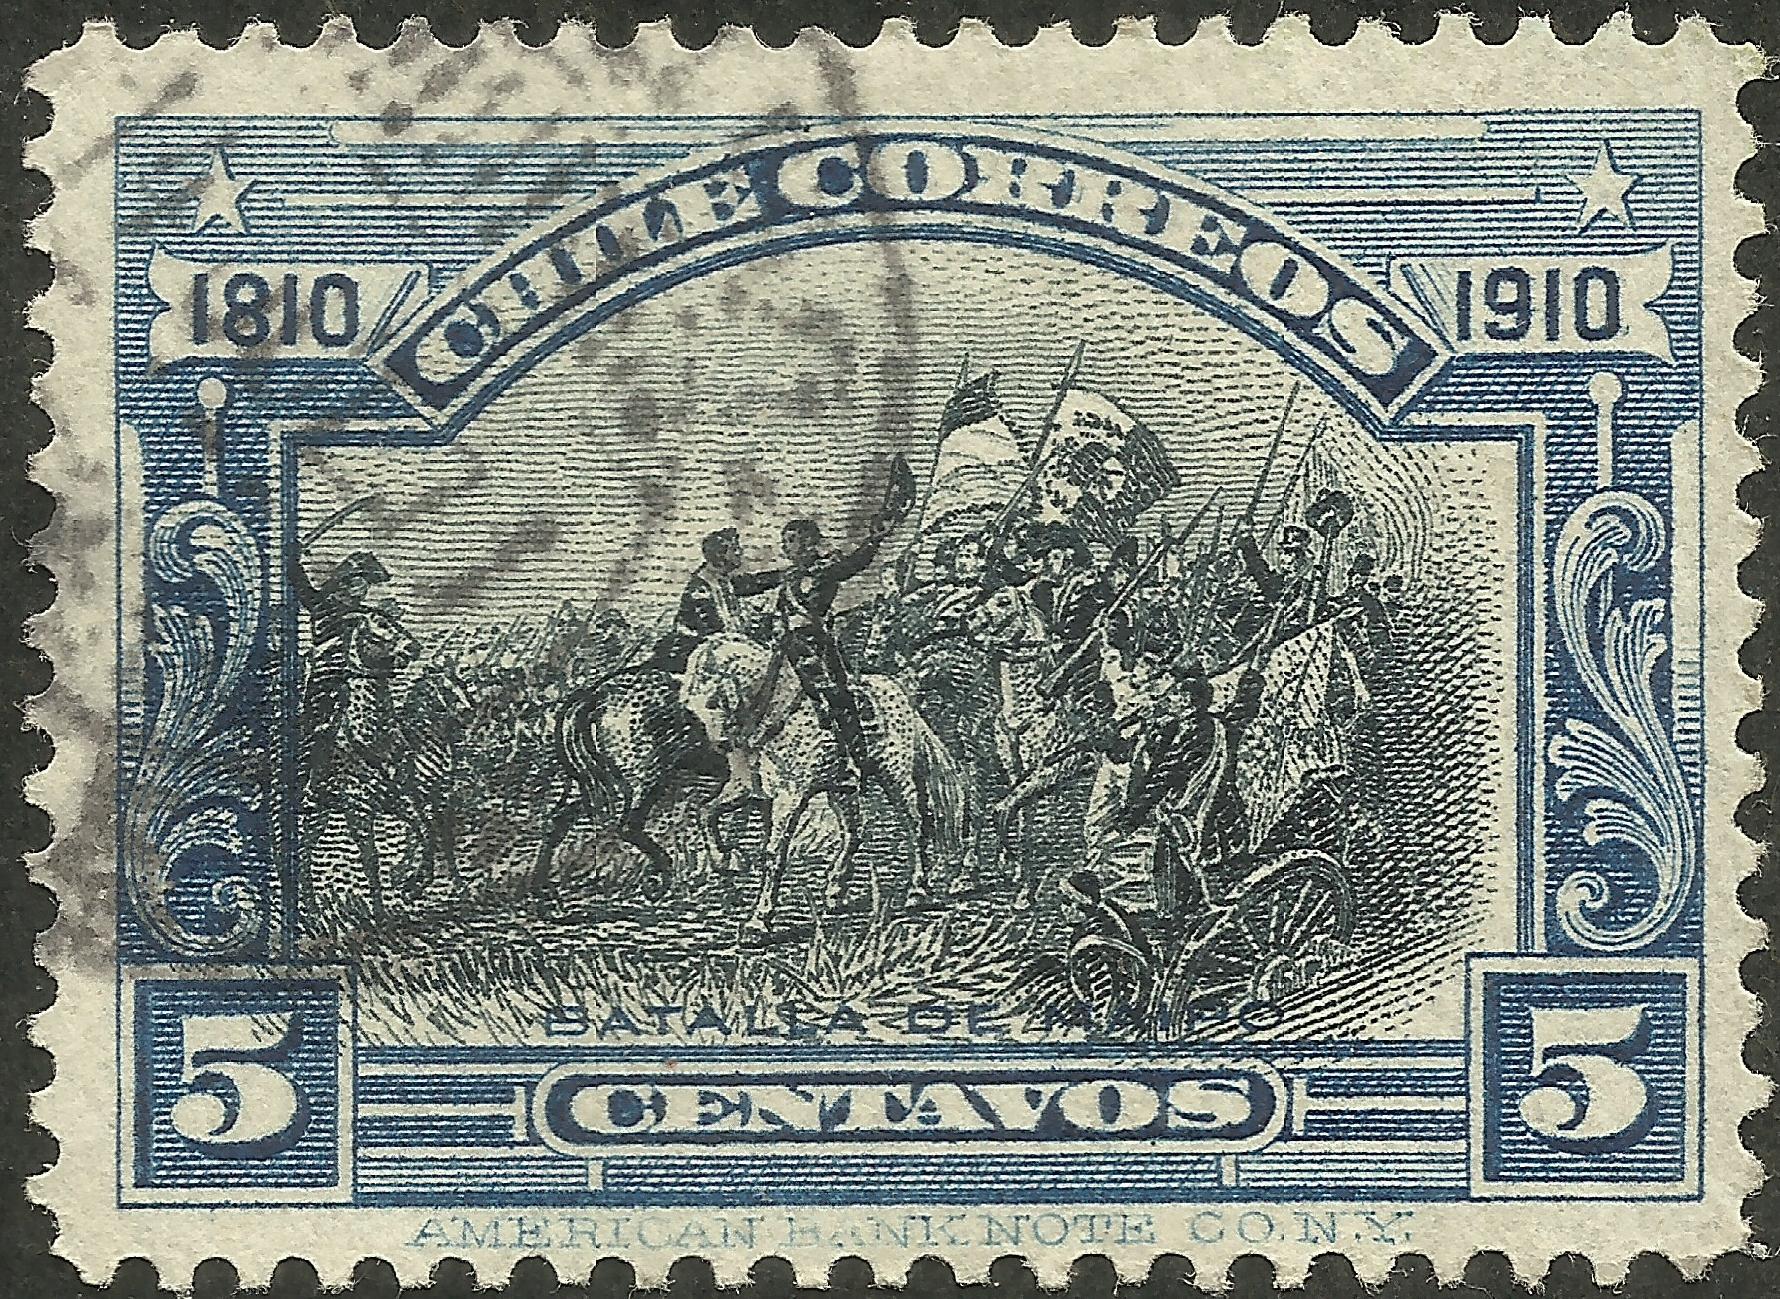 Chile - Scott #86 (1910)